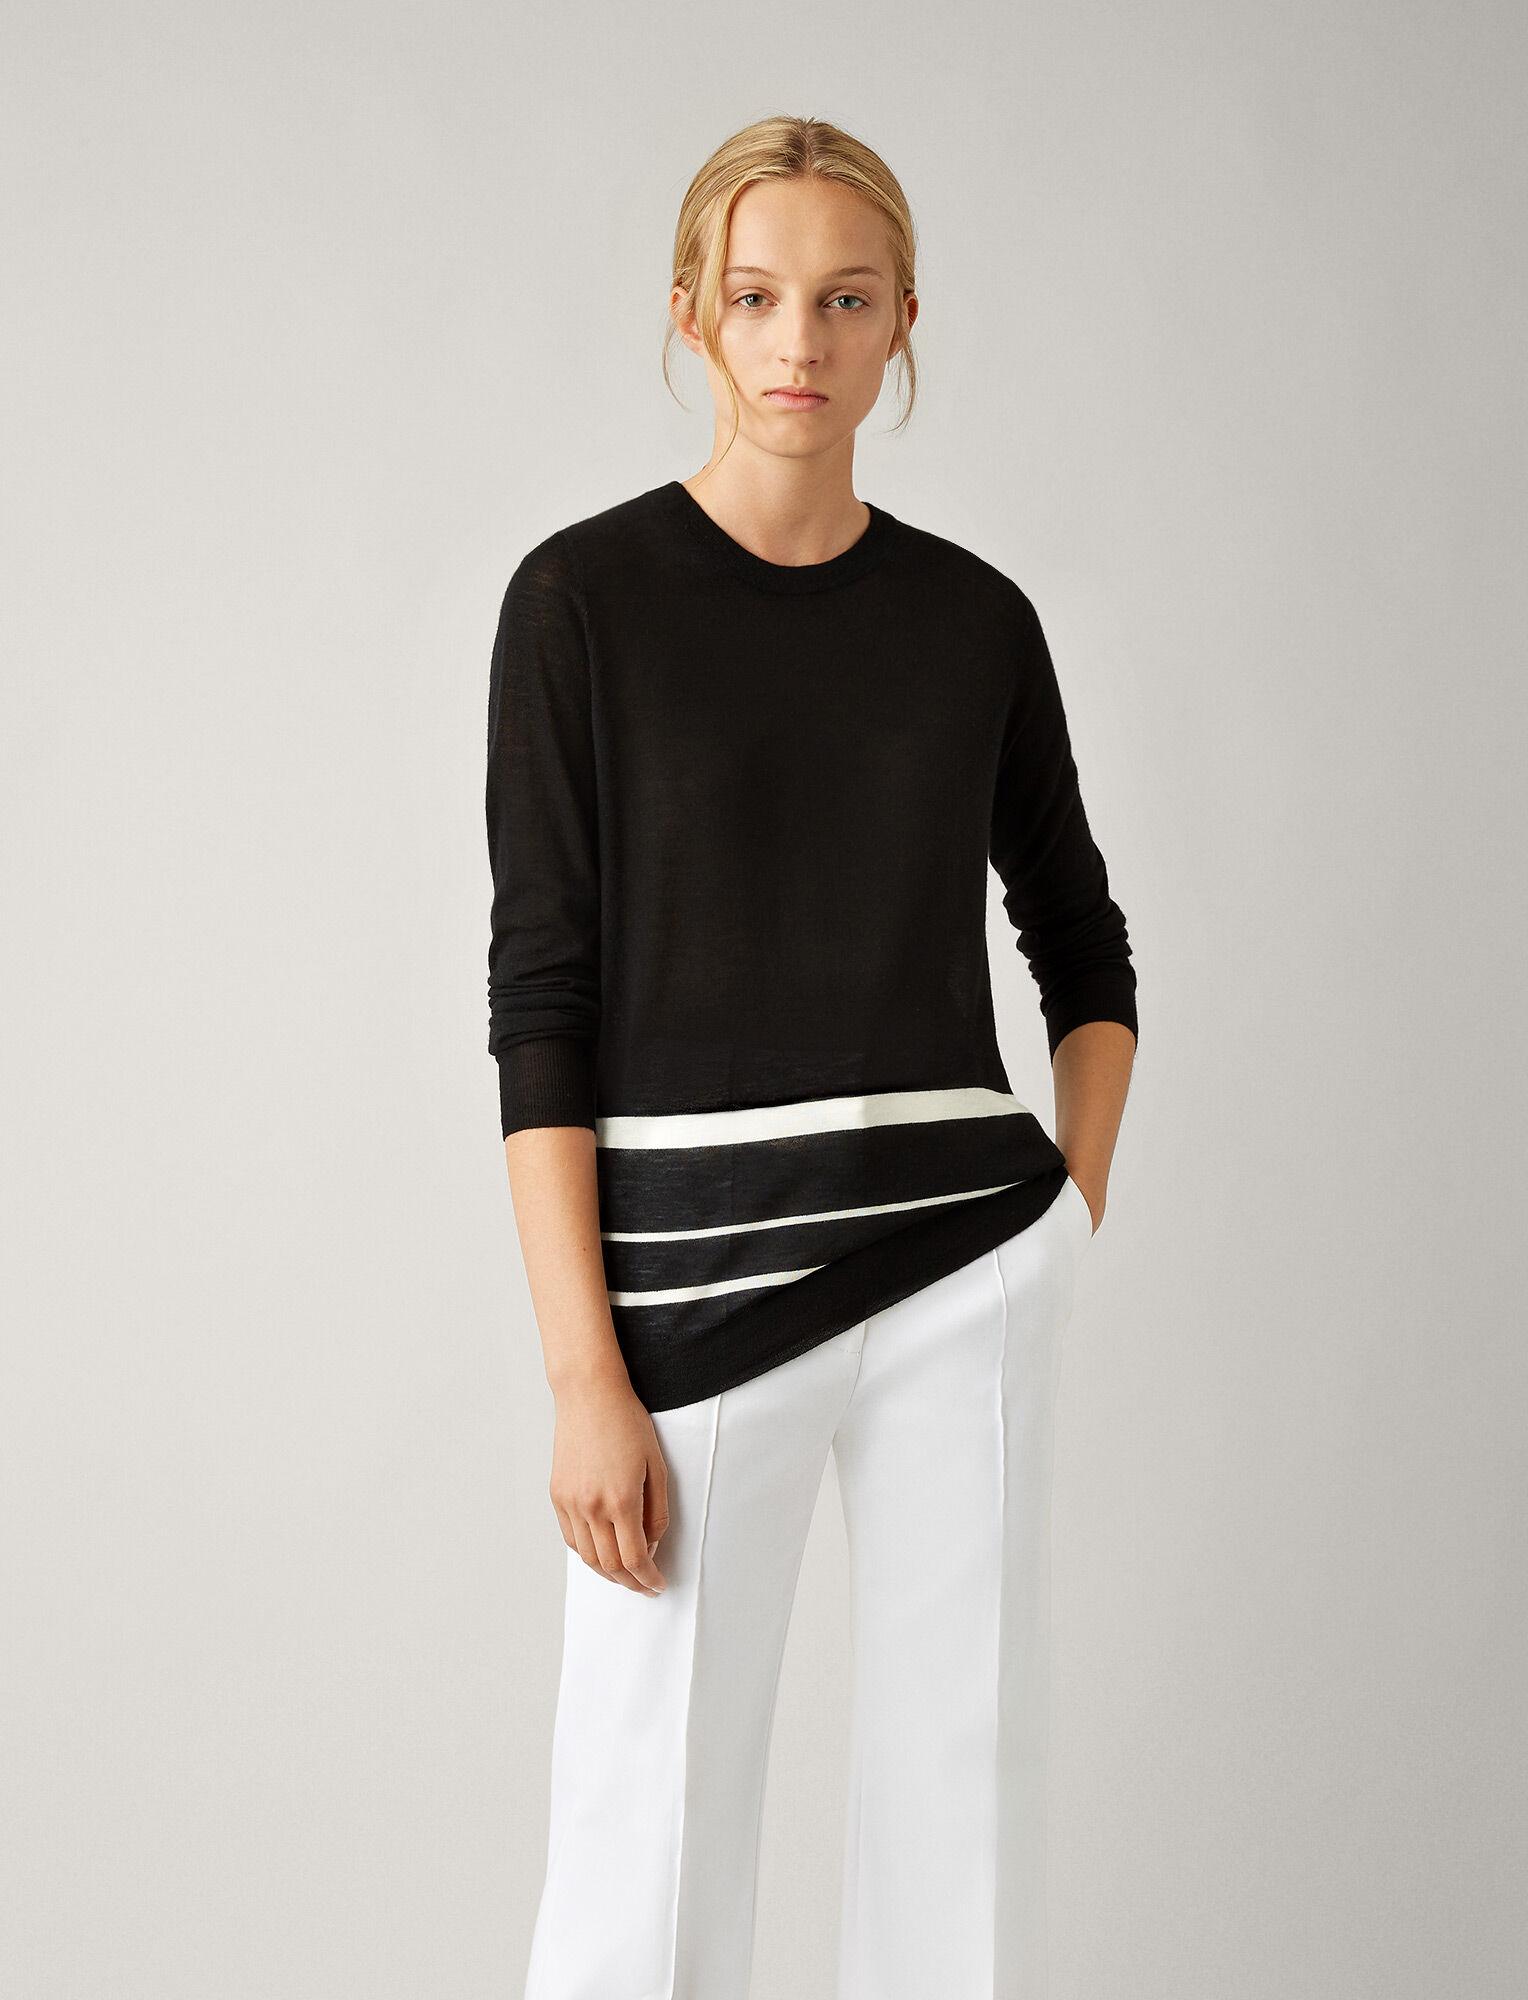 Joseph, Cashair Novelty Knit, in BLACK